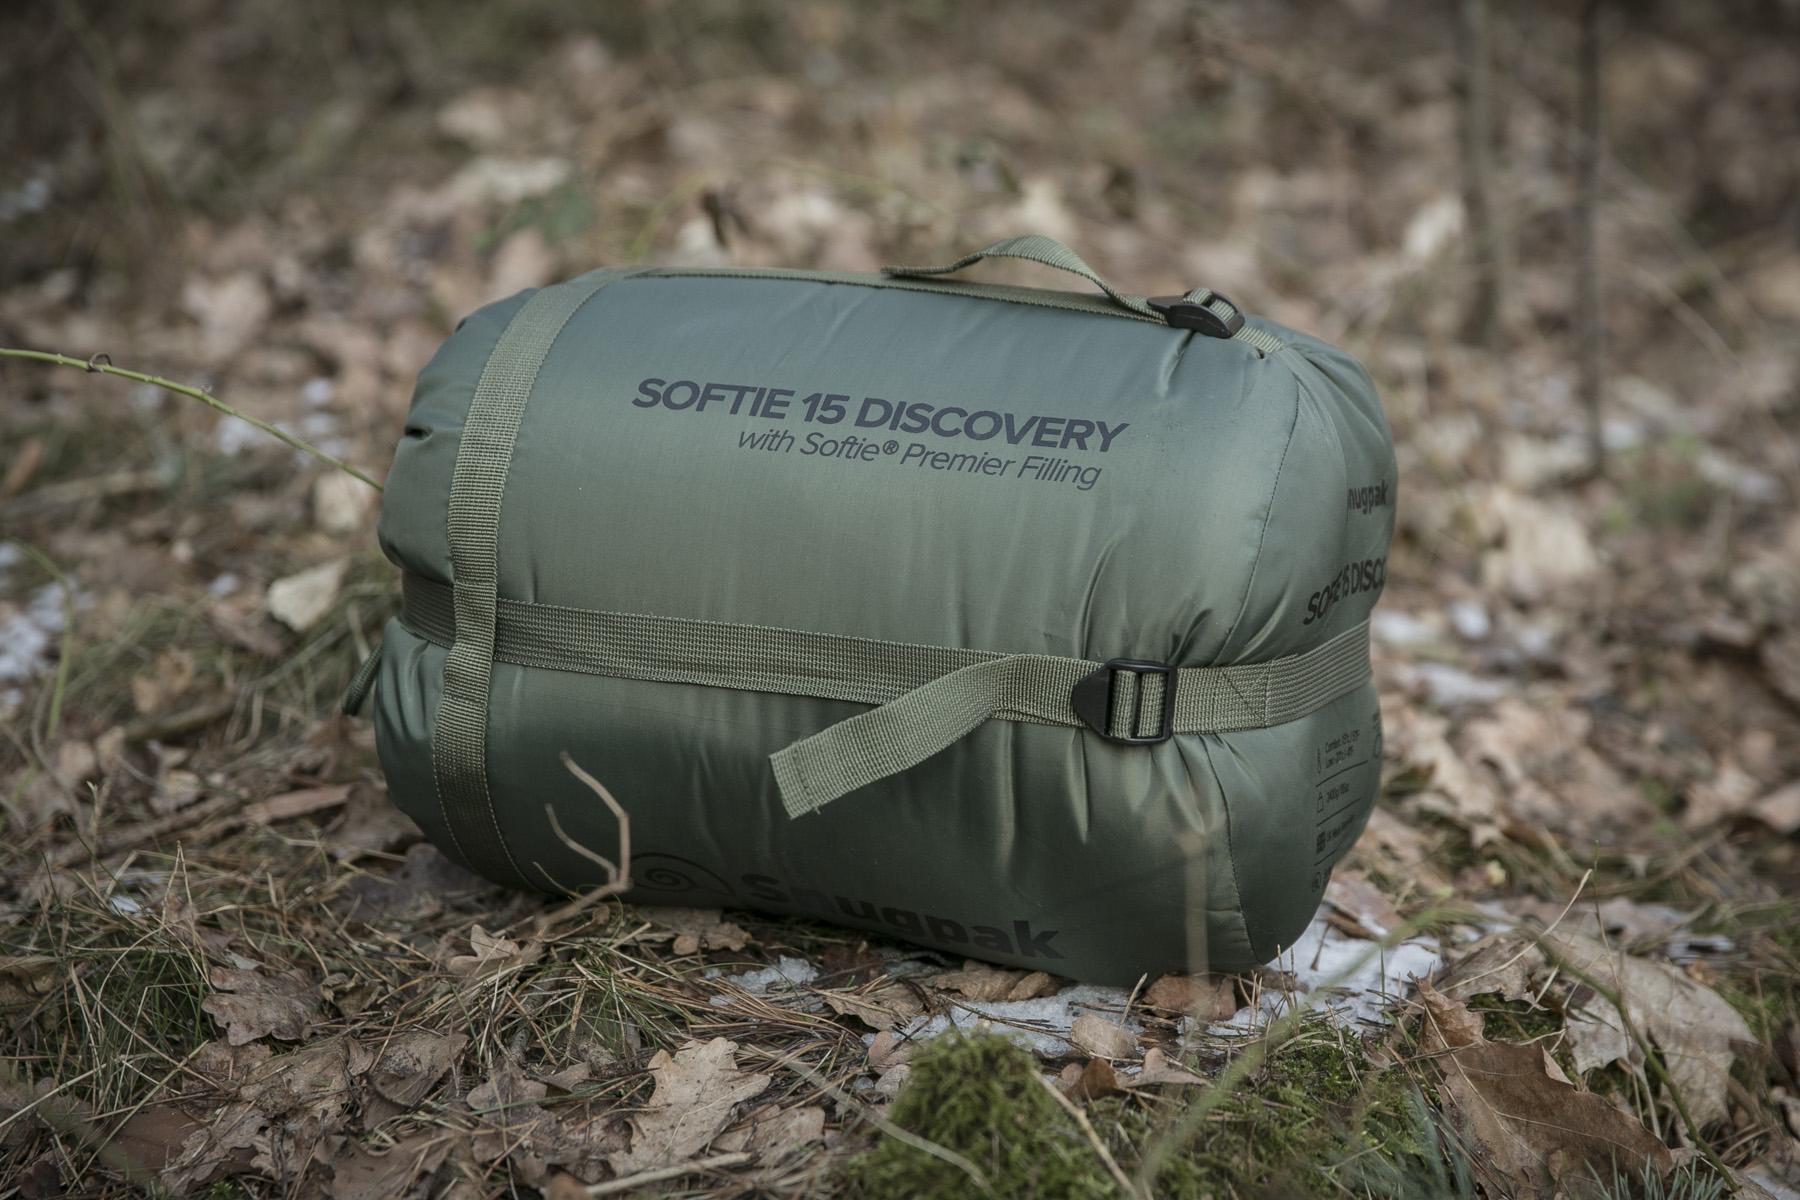 snugpak softie 15 discovery